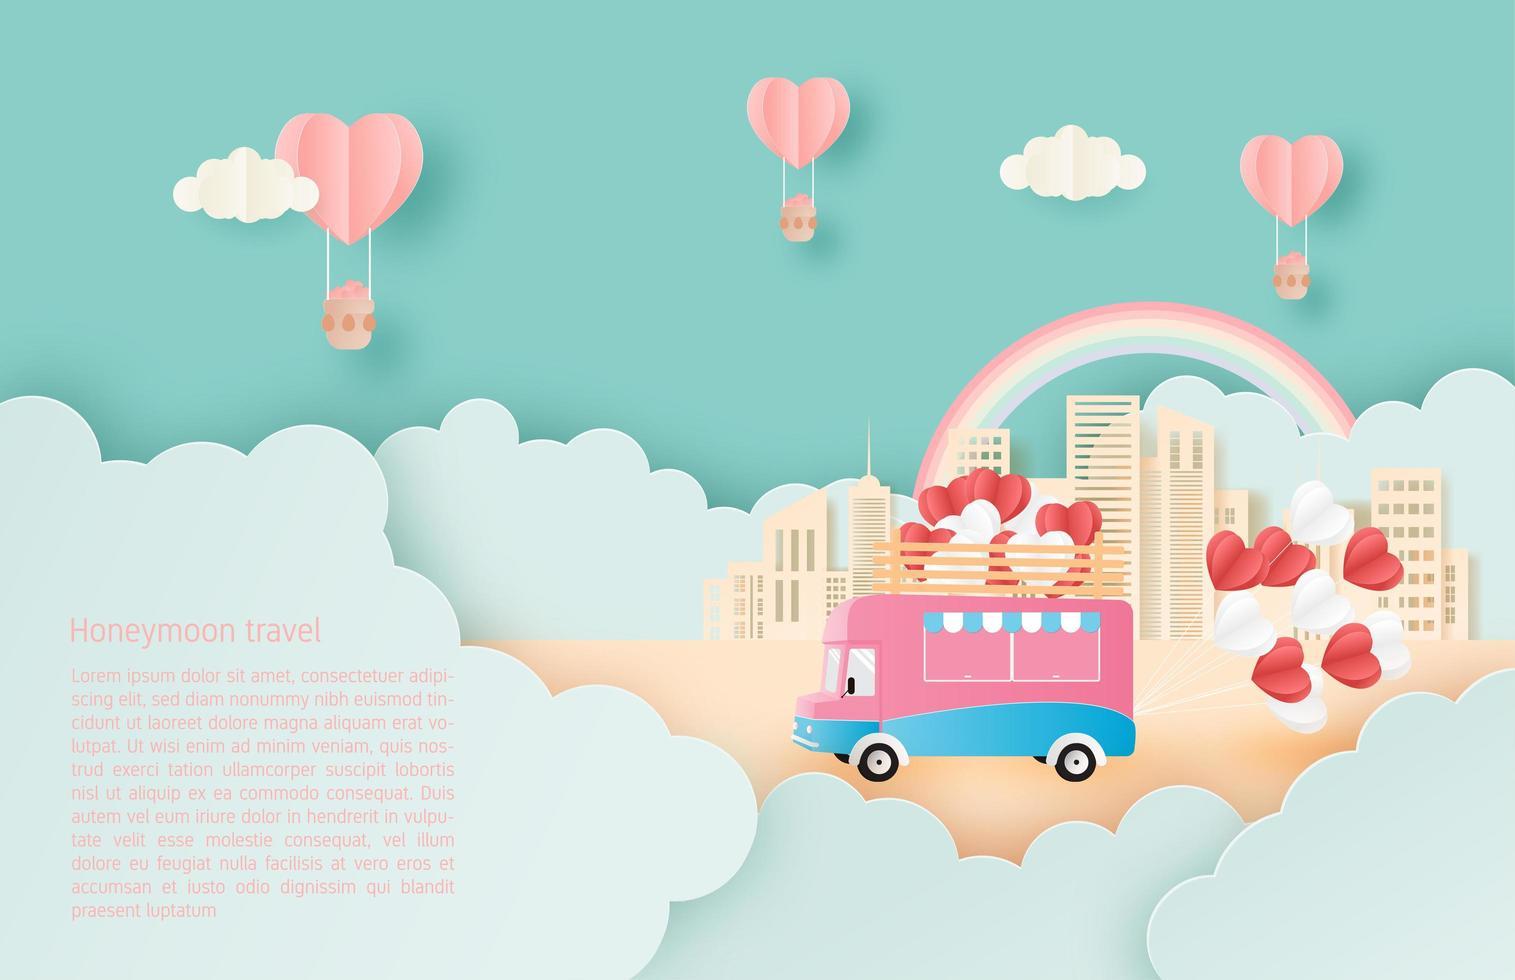 paper art rv hartballonnen trekken tussen wolken vector